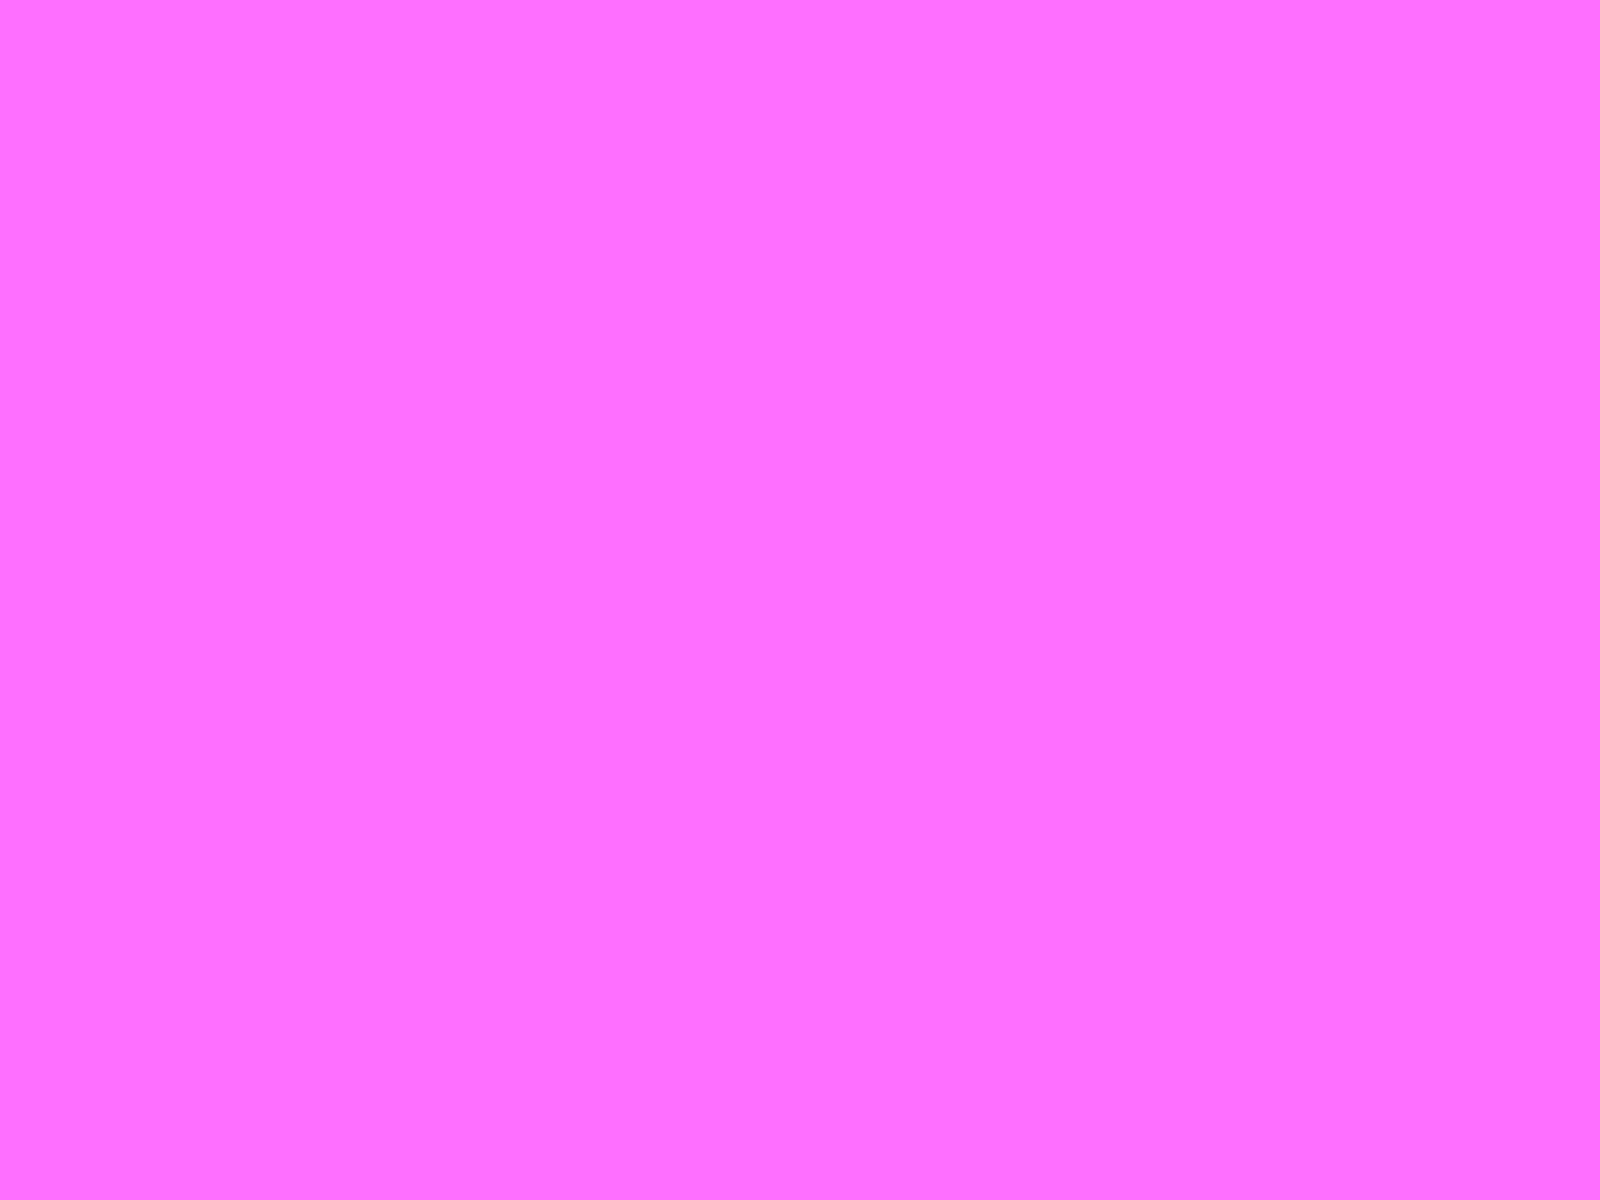 1600x1200 Shocking Pink Crayola Solid Color Background